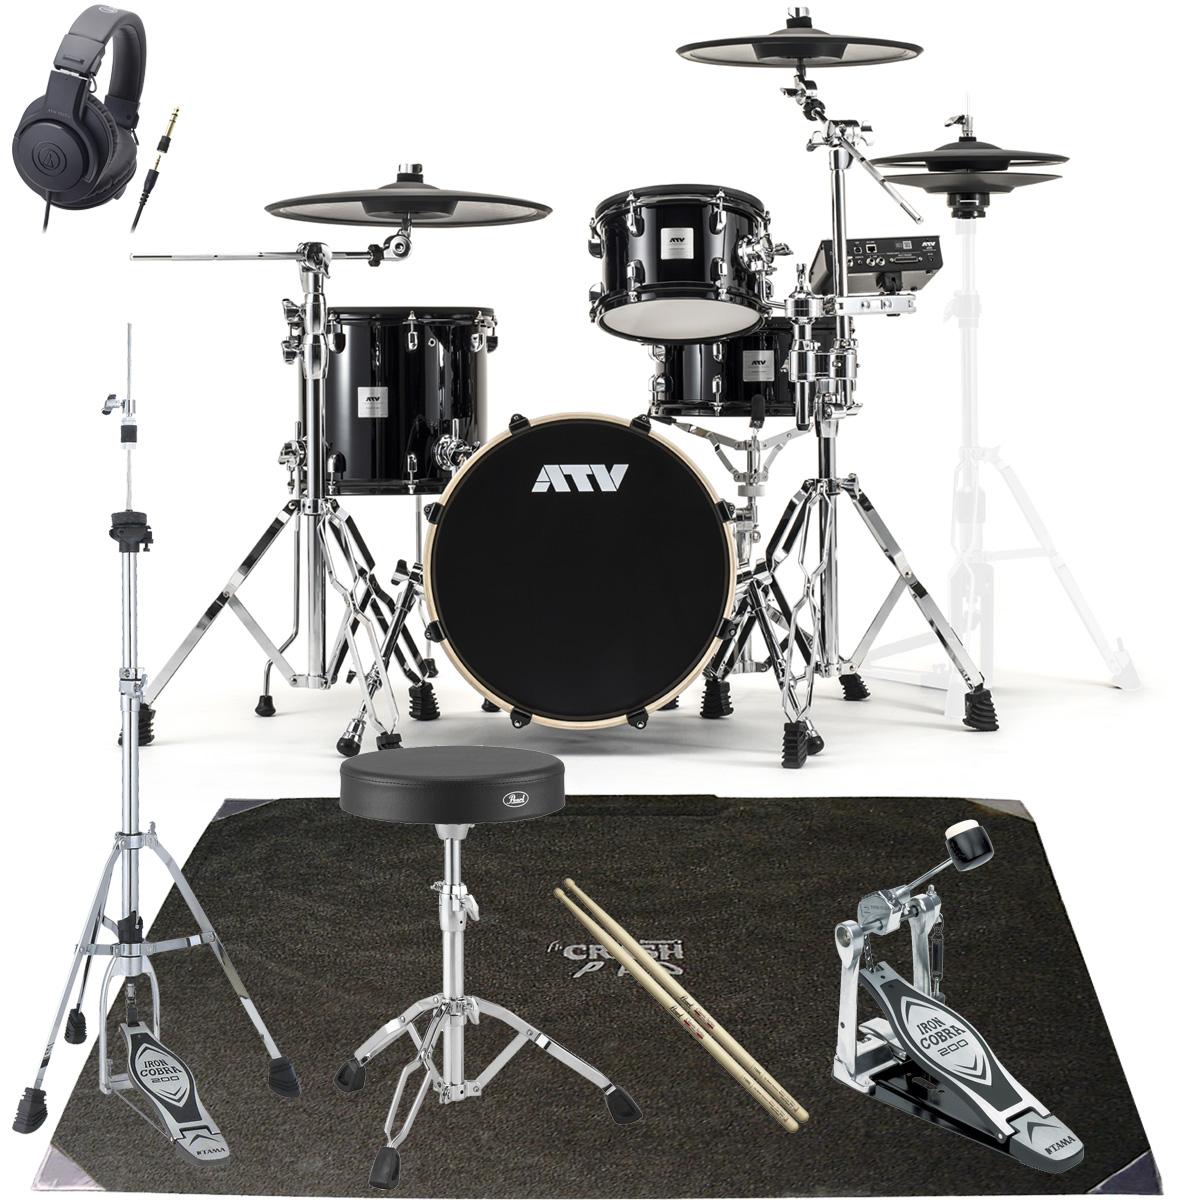 ATV / aDrums artist Standard Set ADA-STDSET オリジナルベーシックパック PEARLマット付き《予約注文/納期12月上旬頃予定》